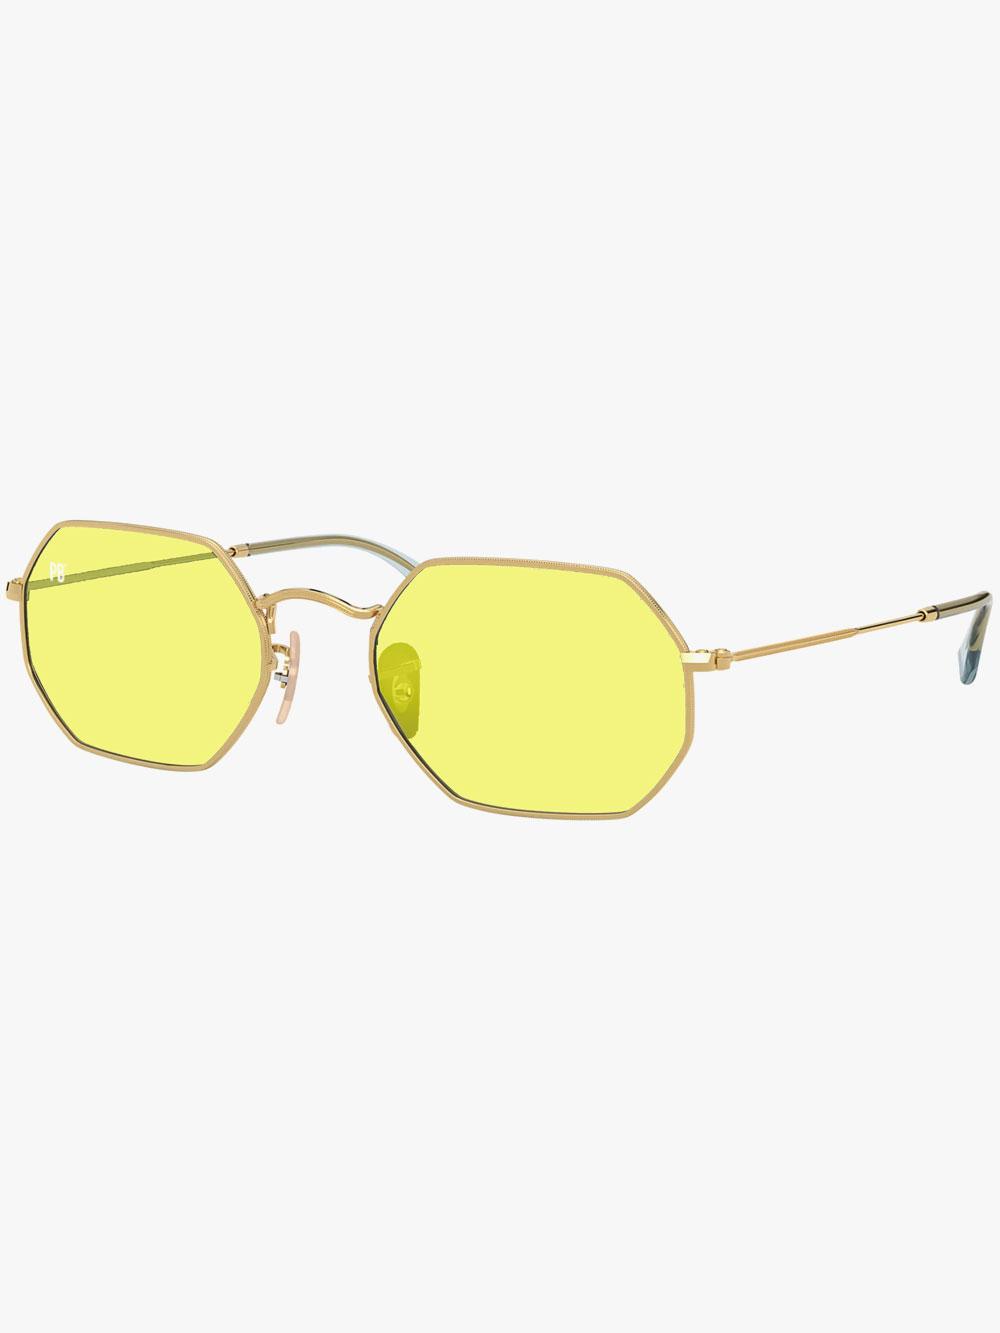 octa-yellow